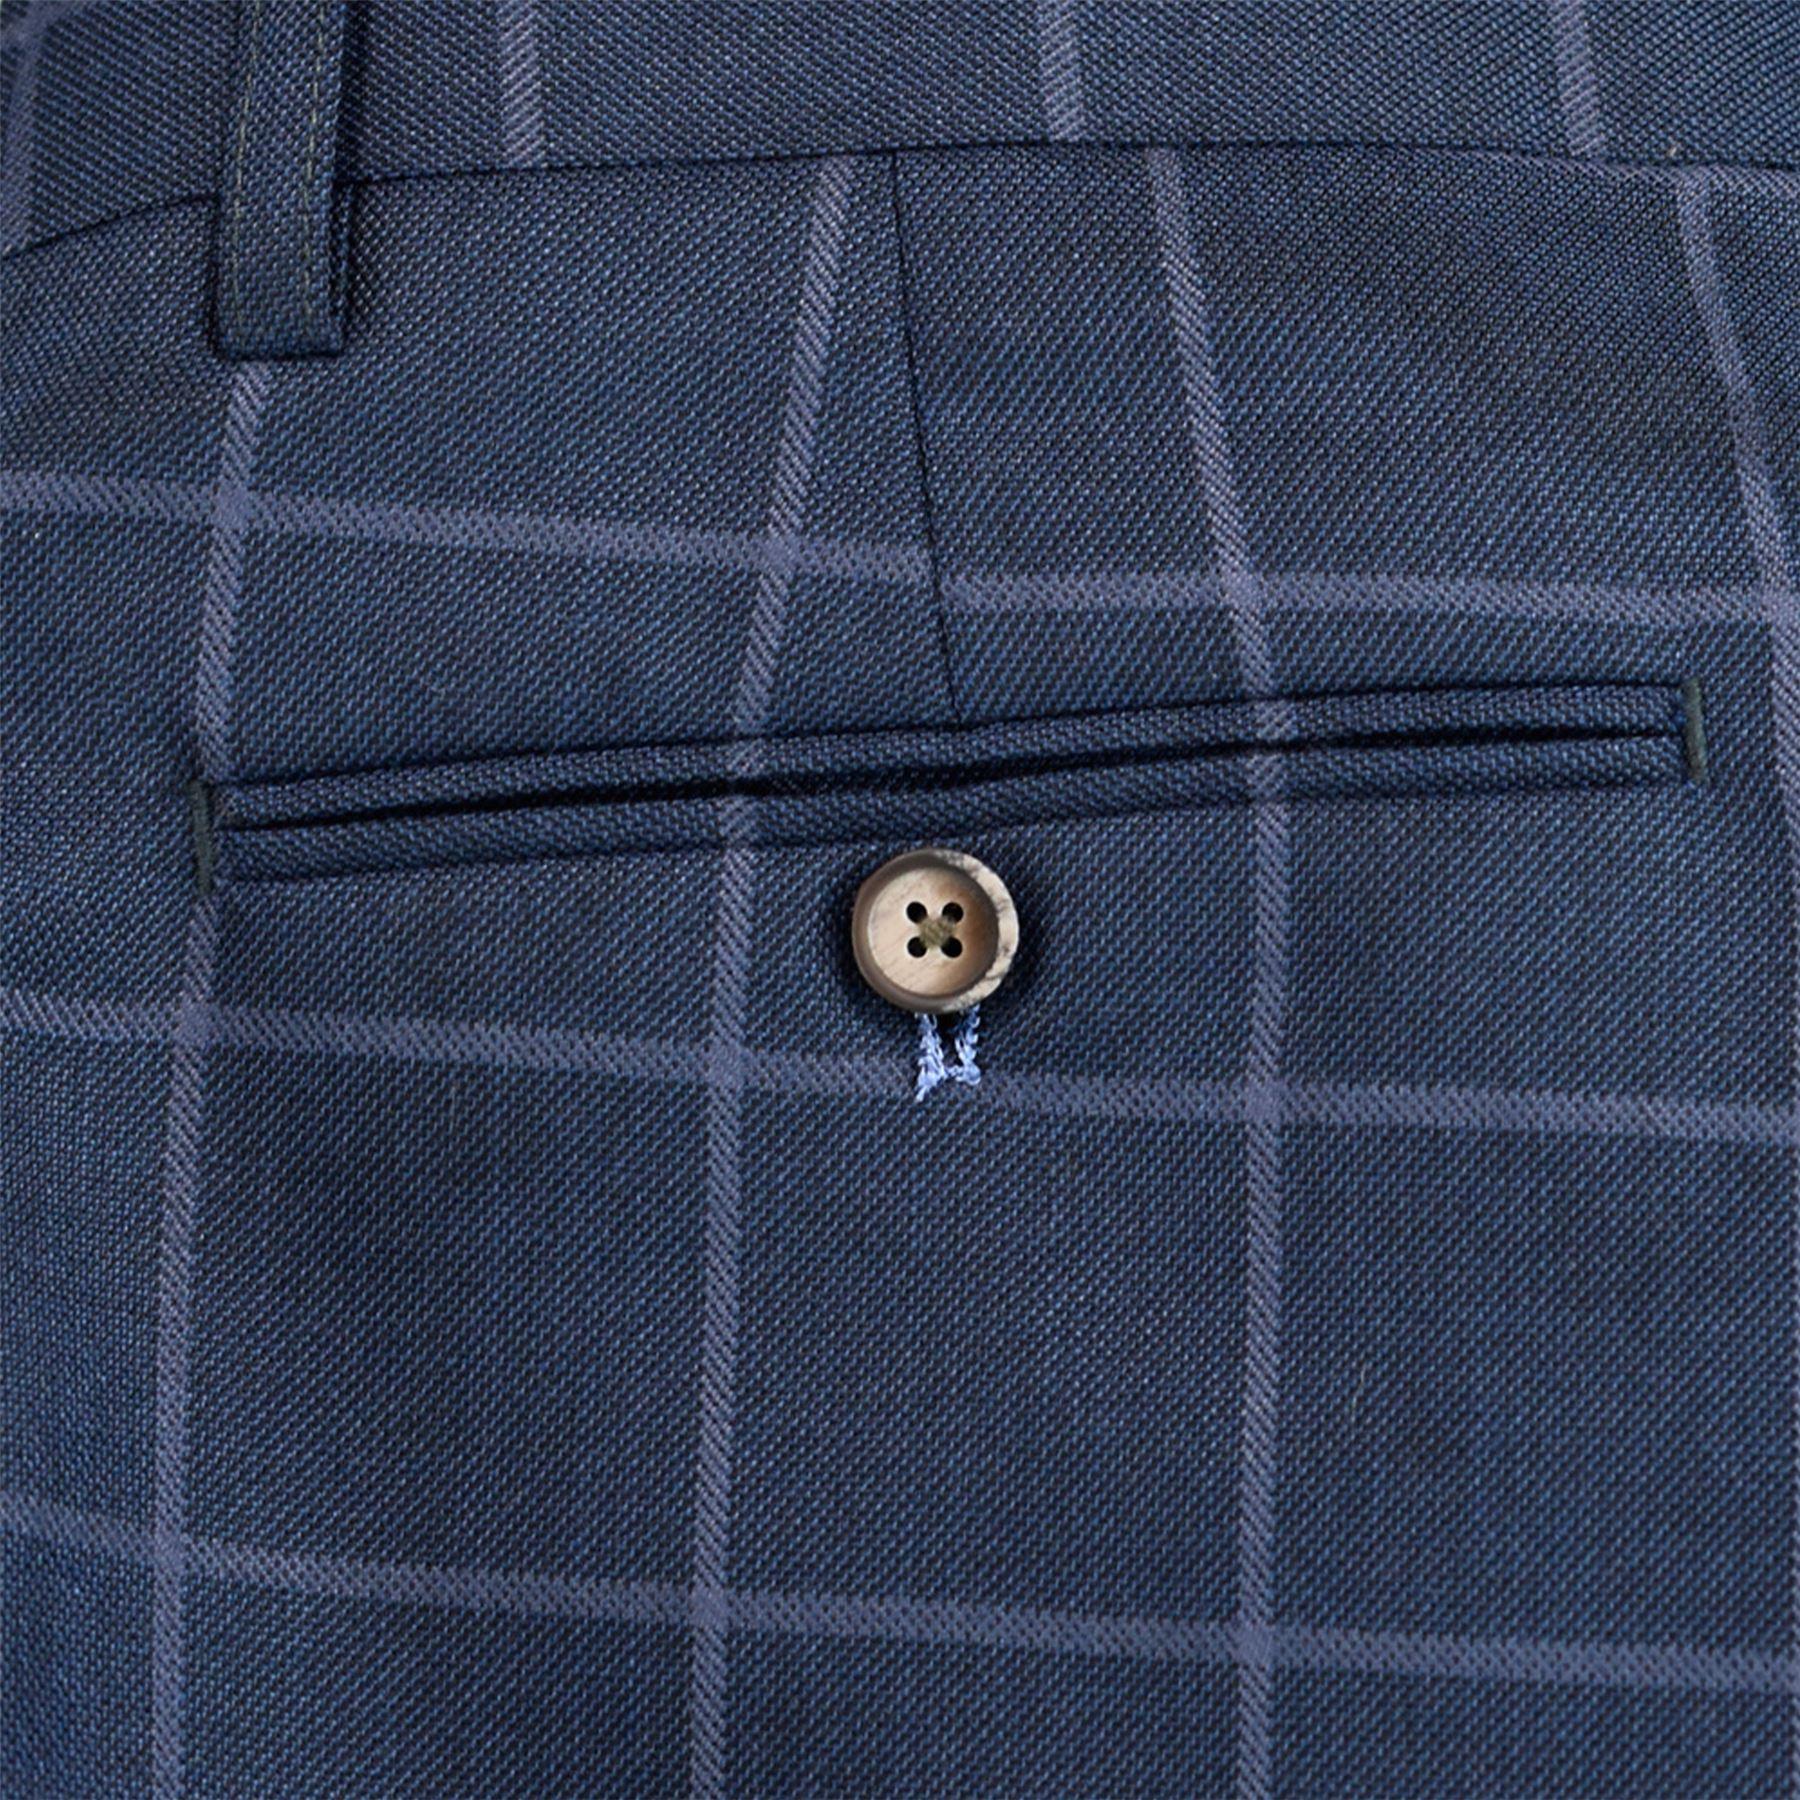 Blazer-Para-Hombre-Cavani-Macy-Boda-Chaleco-Pantalones-3-piezas-traje-se-vende-por-separado miniatura 7